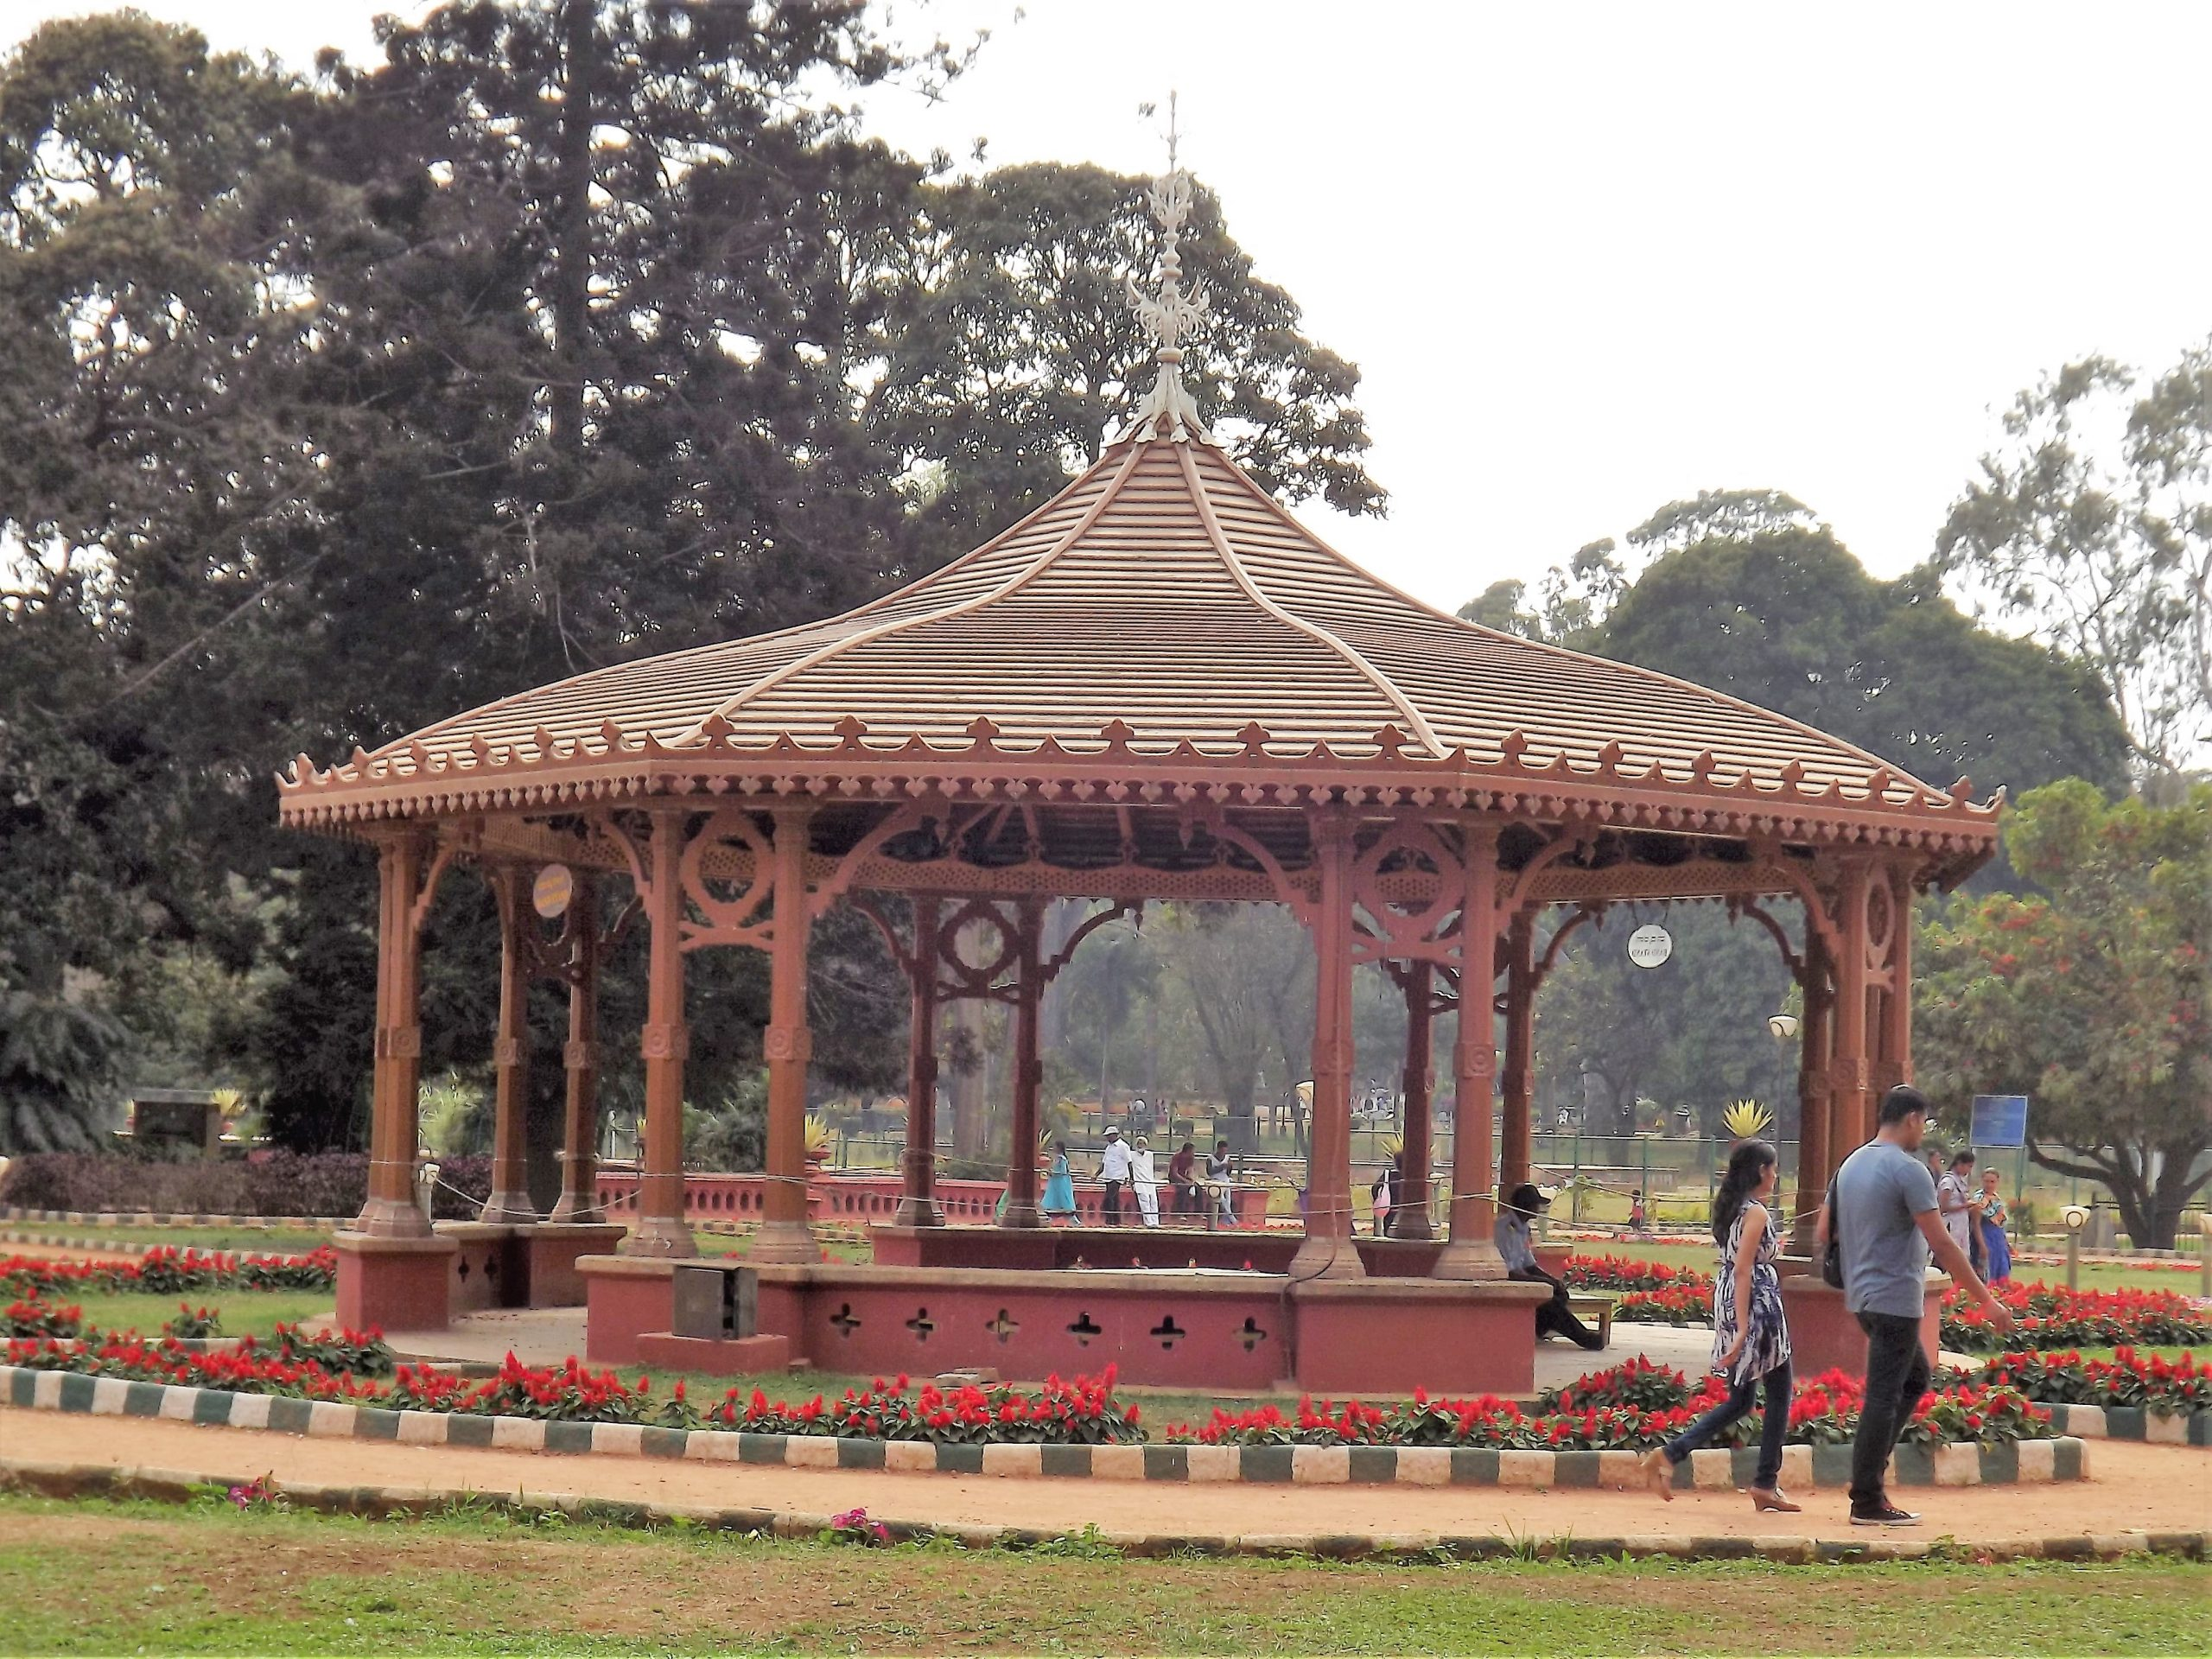 Garden in Bangalore